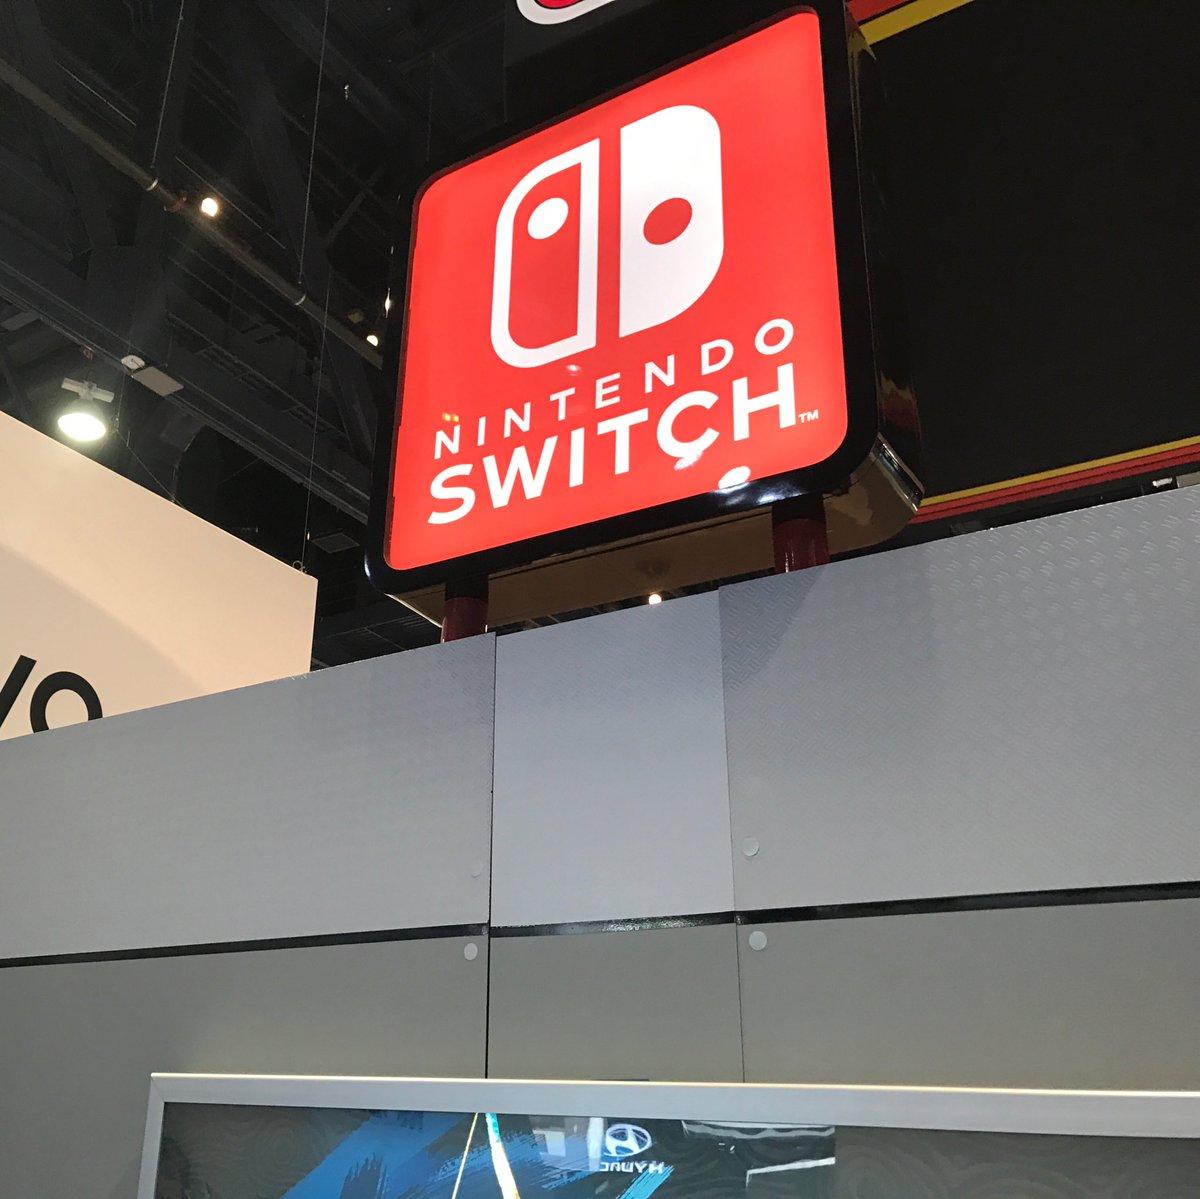 Actually, seen at #CES2017... #Nintendo #NintendoSwitch https://t.co/3Oc21zmI13